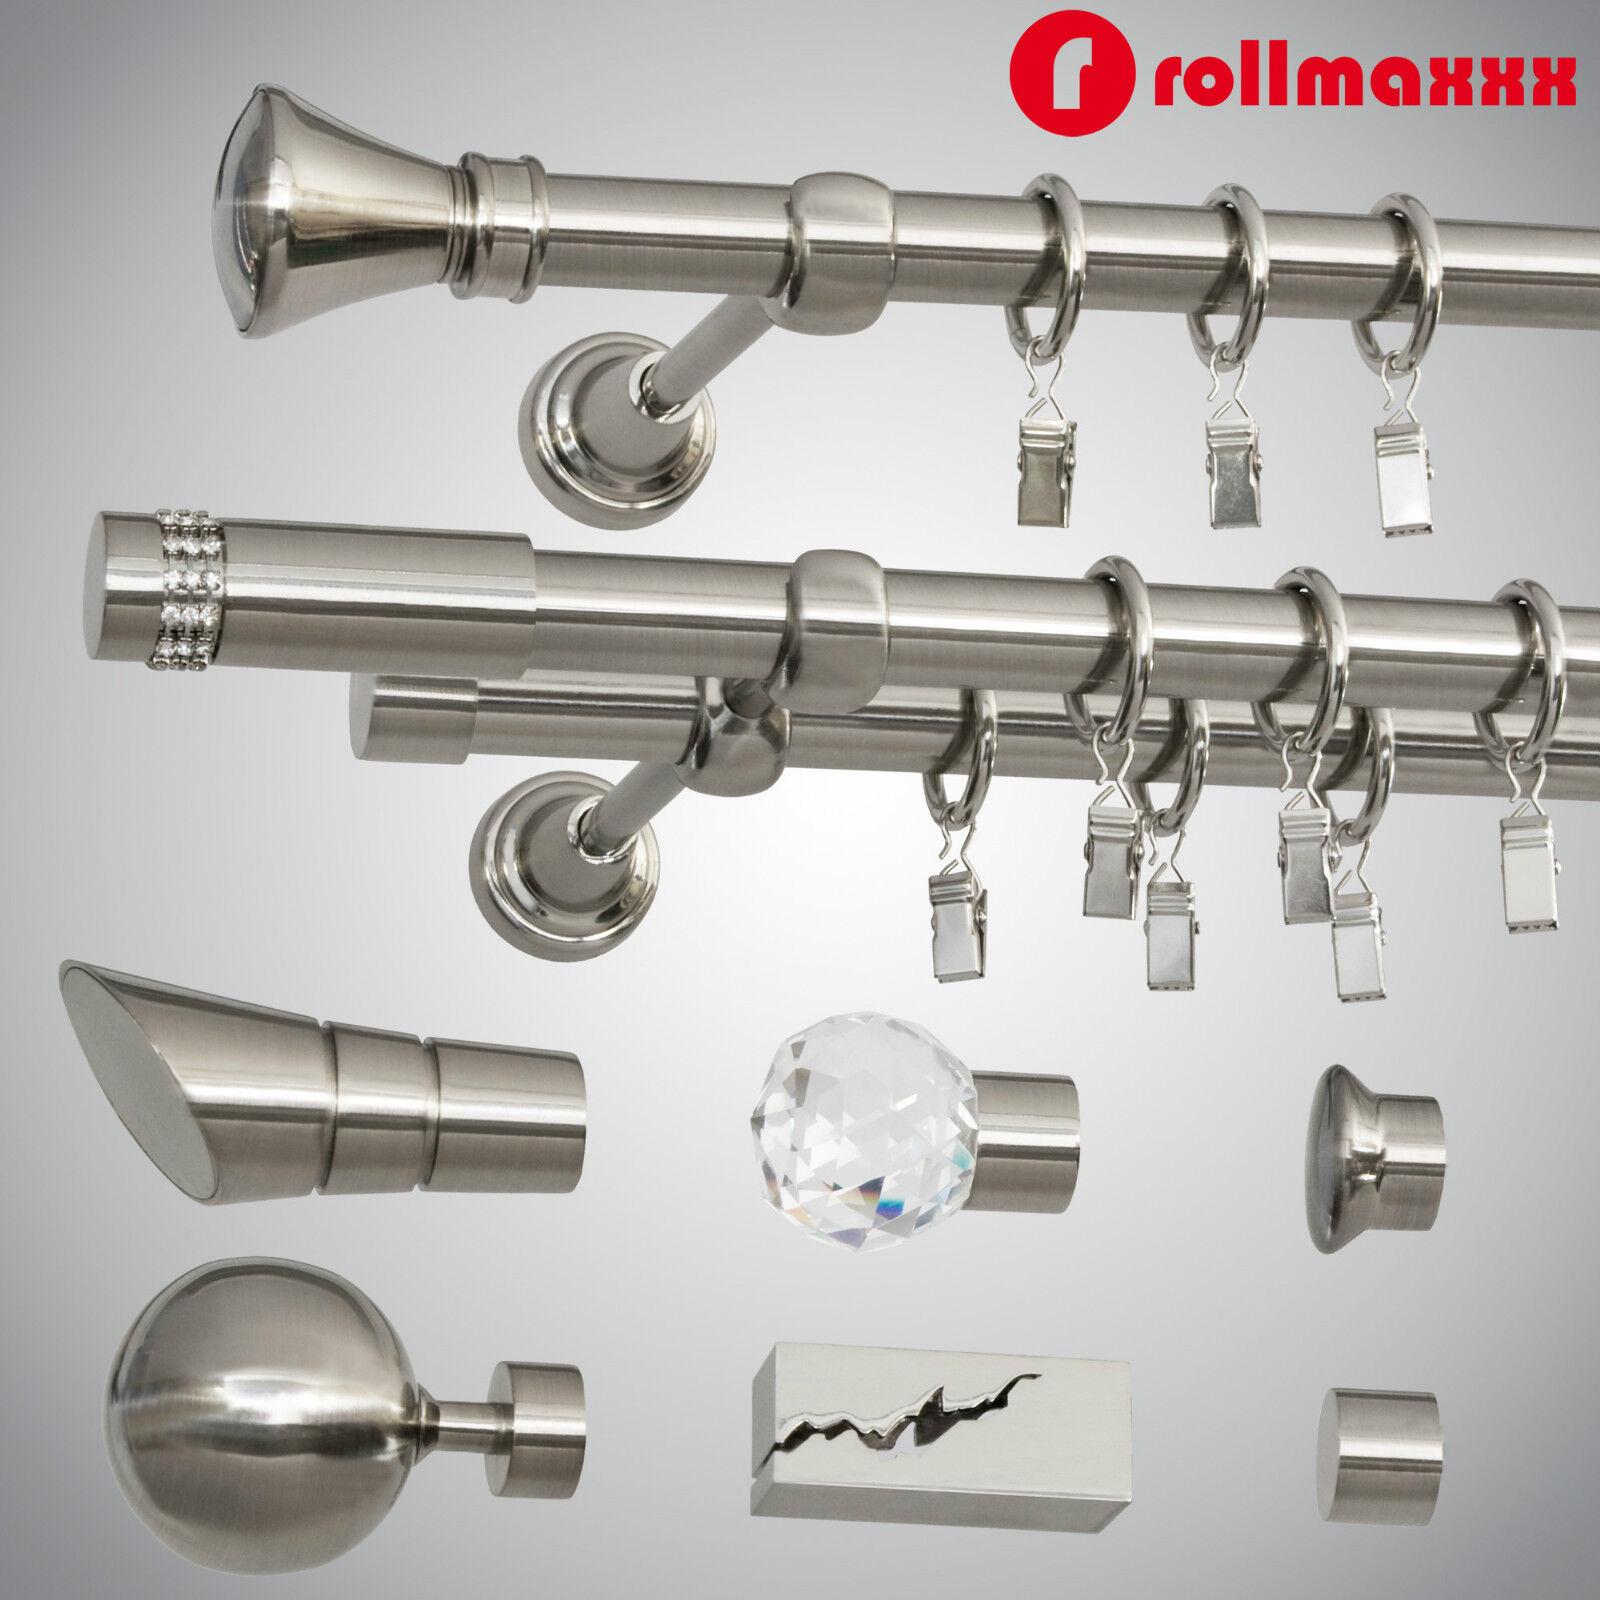 Gardinenstangenhalter Edelstahl gardinenstange vorhangstange 19mm 1 läufig 2 läufig edelstahl design